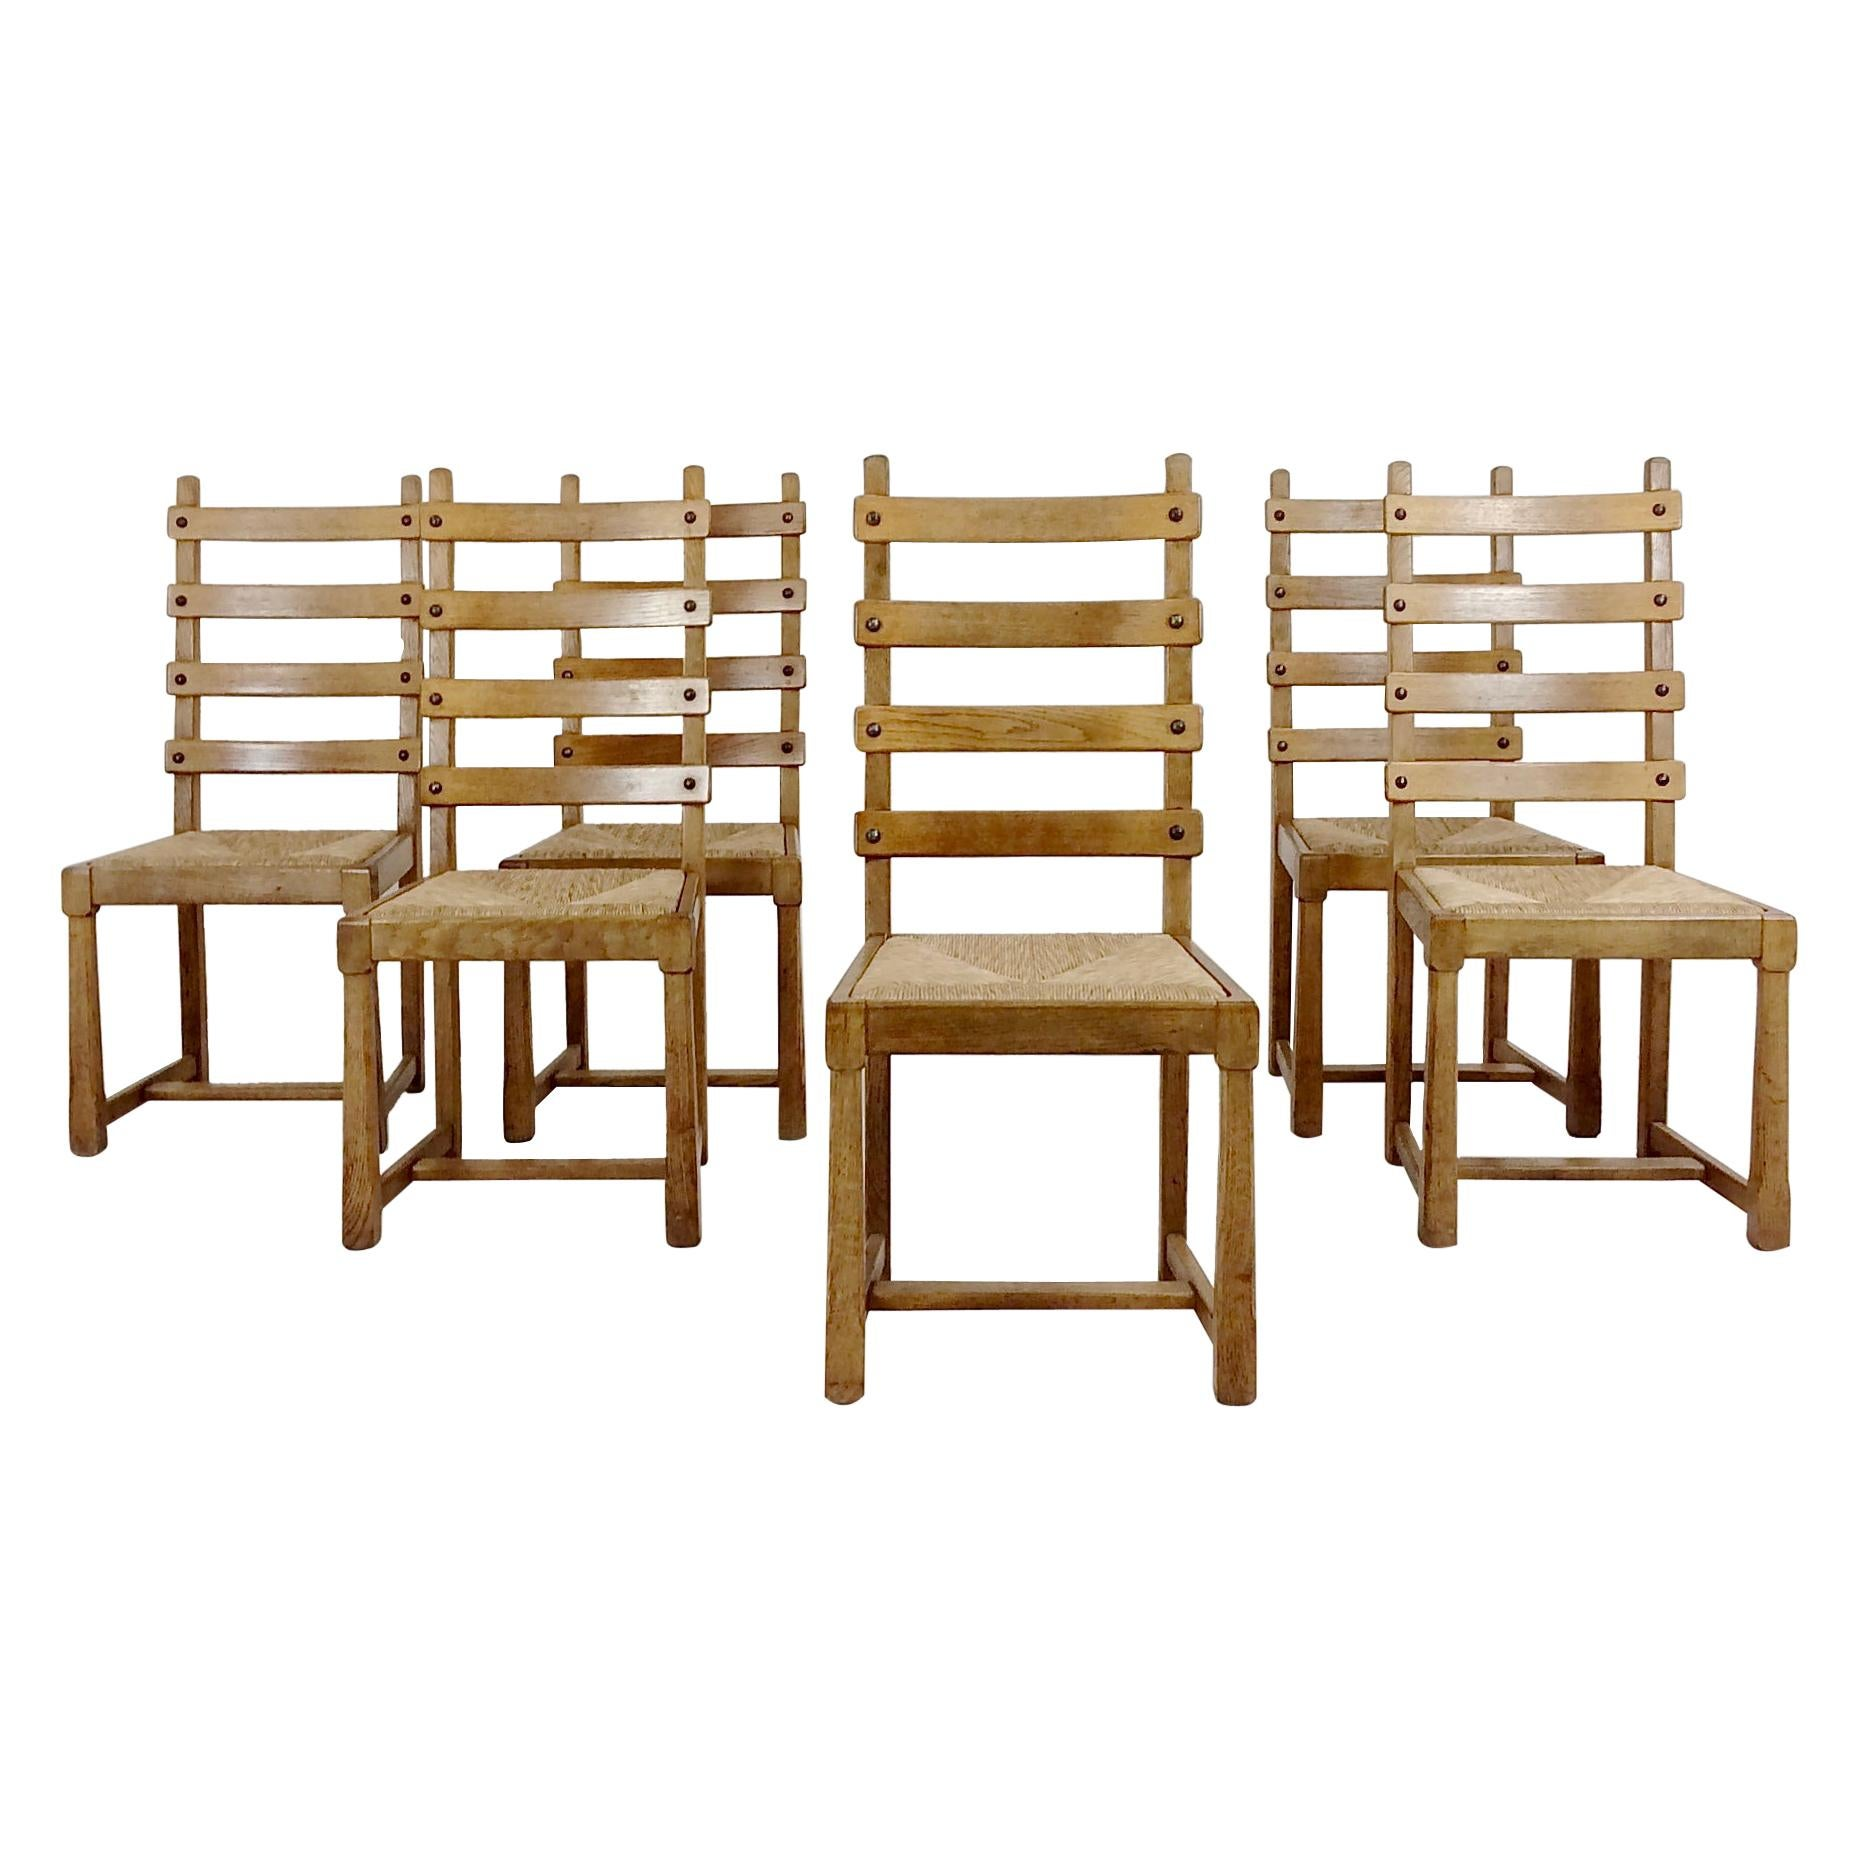 Set of Six Scandinavian Midcentury Oak and Straw Chairs, circa 1950